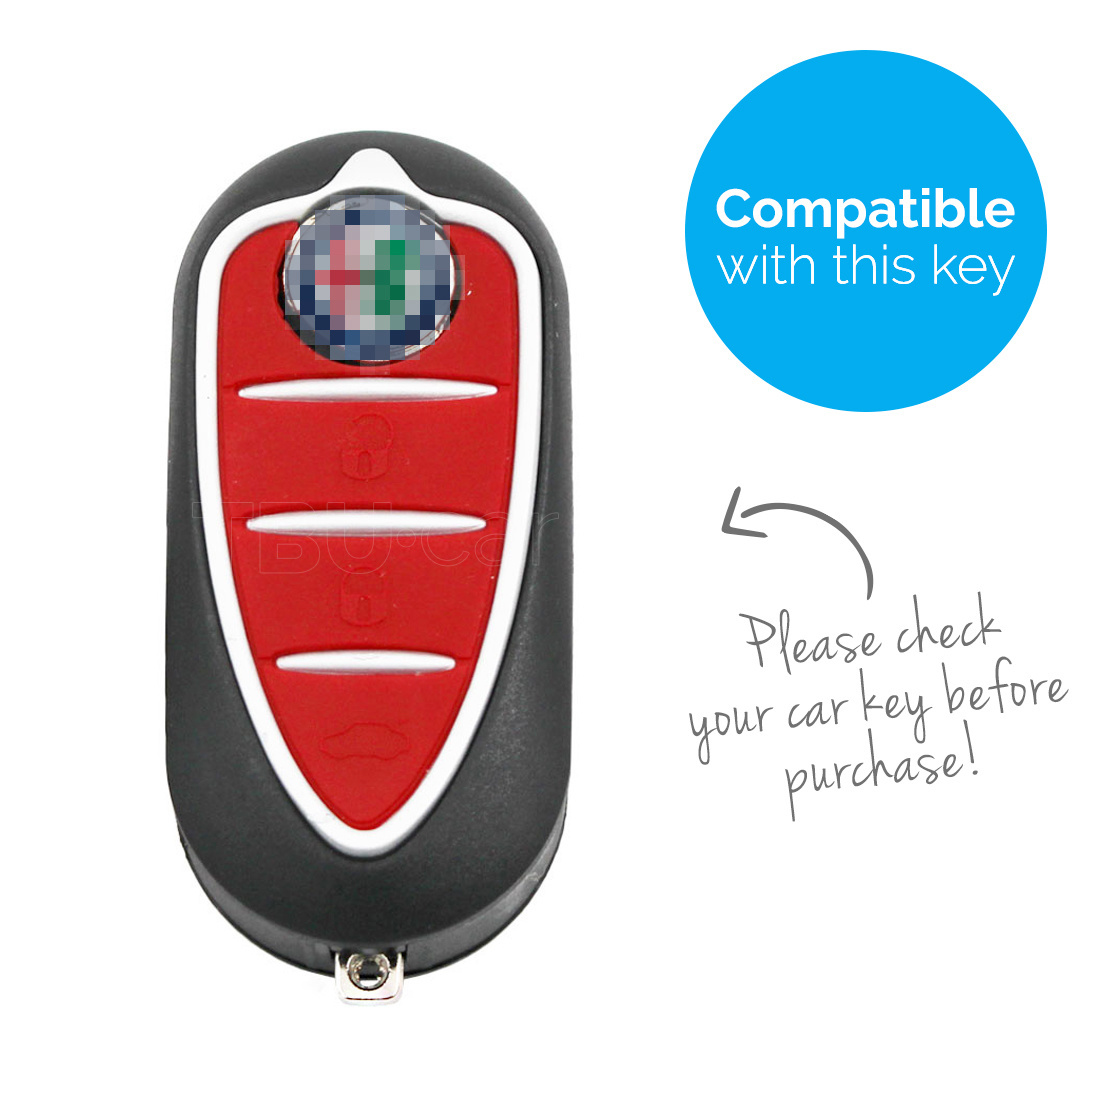 TBU car TBU car Funda Carcasa llave compatible con Alfa Romeo - Funda de Silicona - Cover de Llave Coche - Azul